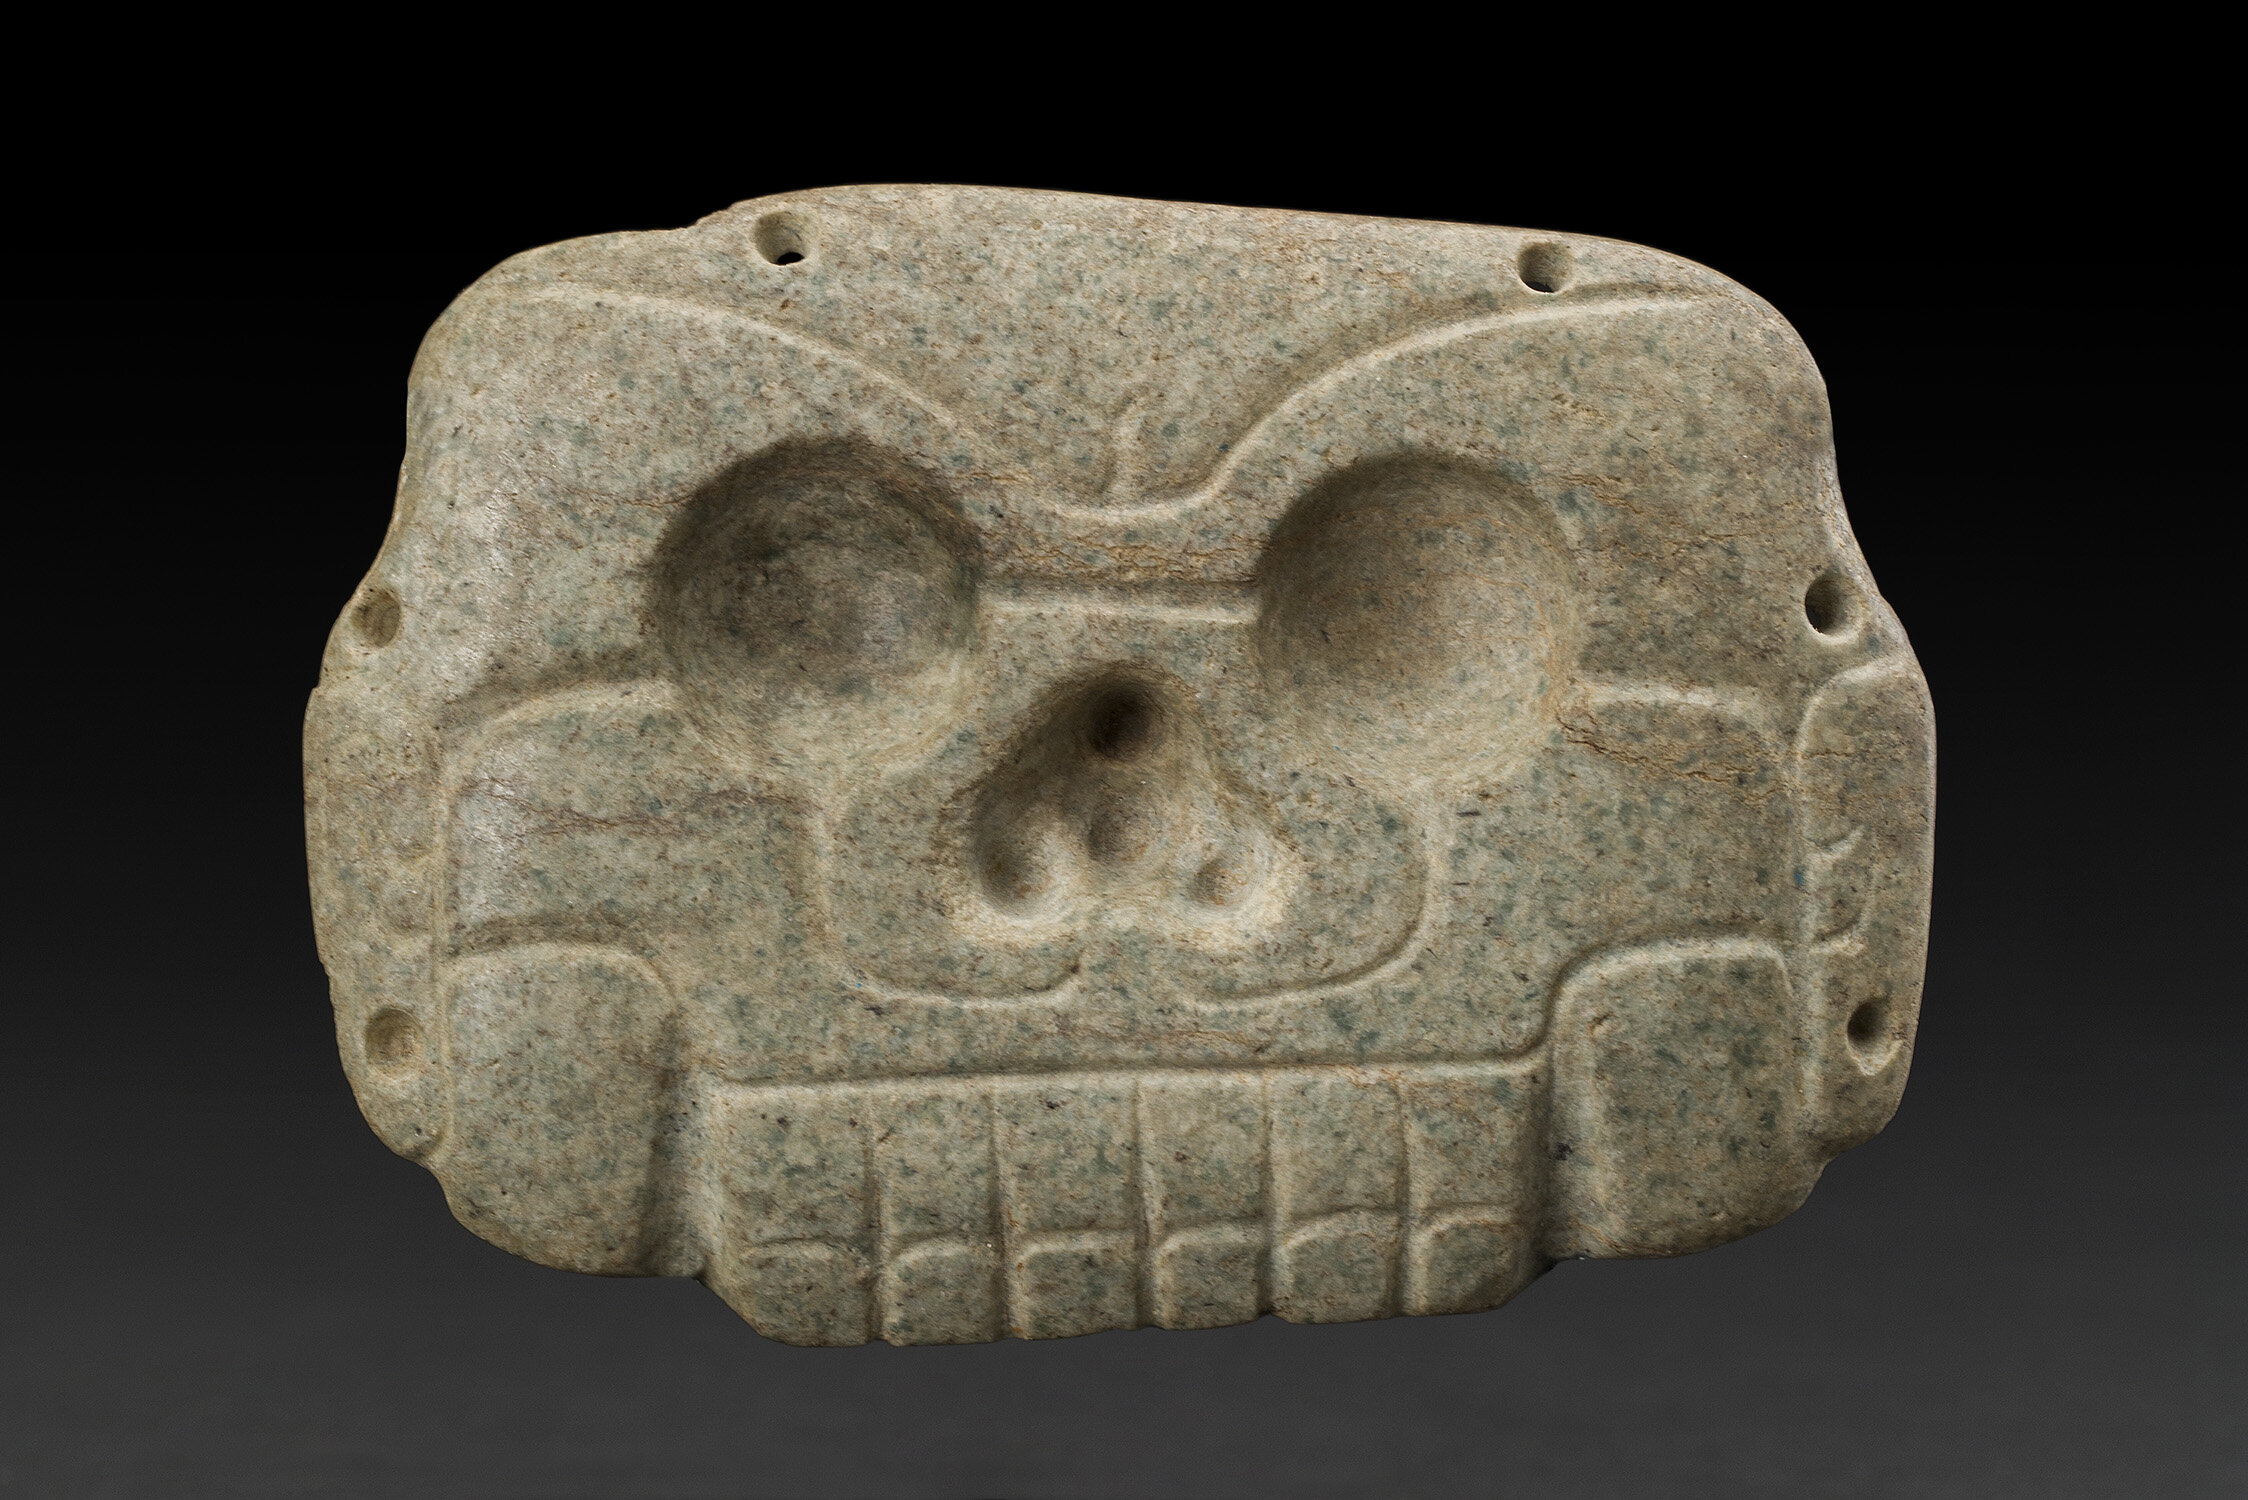 Masks  Mayan Skull Head Pendant  , 600-900 CE Green Stone 3 x 4.25 x .375 inches 7.6 x 10.8 x 1 cm M 411